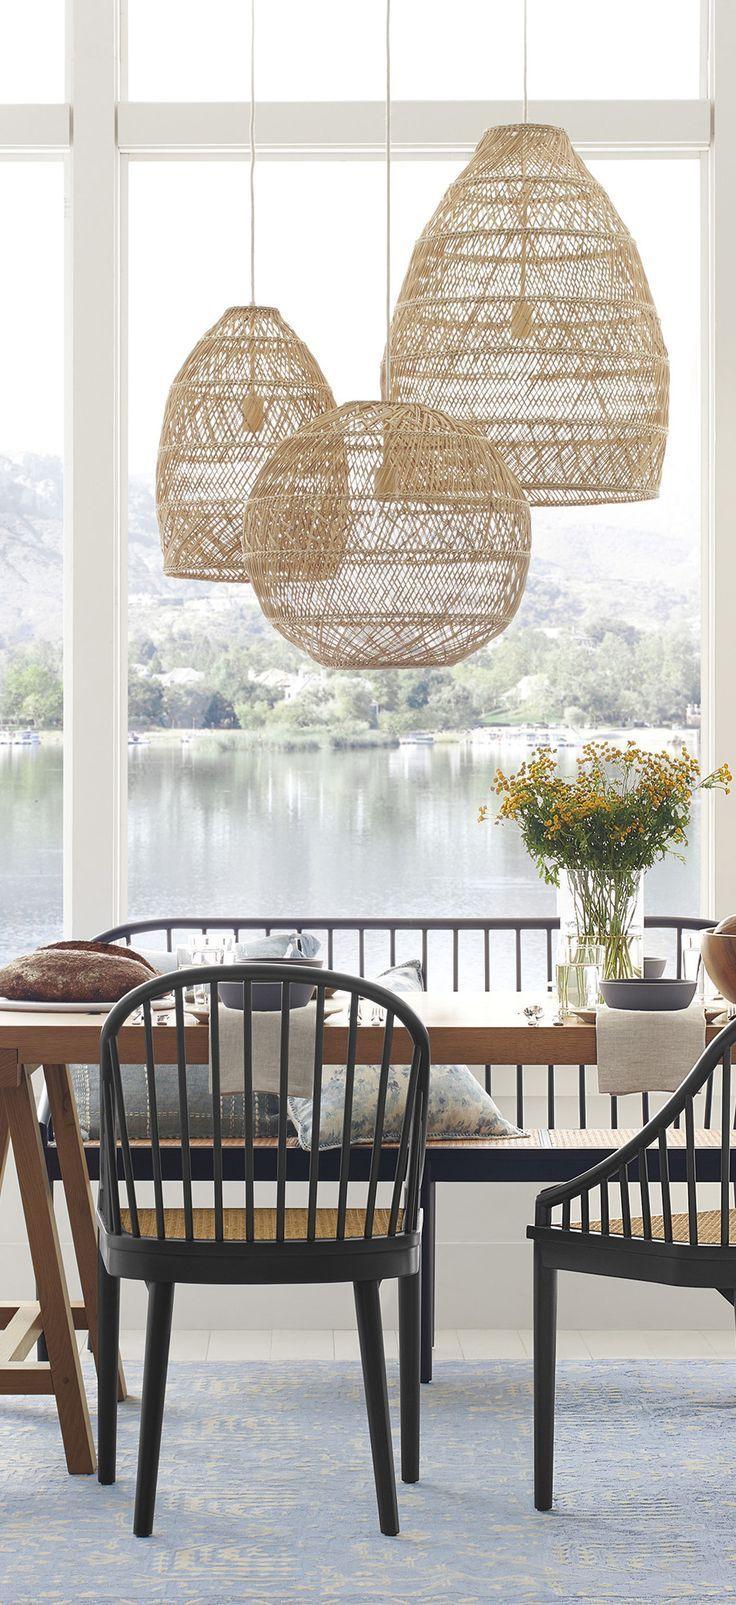 Large Rattan Pendant Lights Scandinavian Design Scandinavian Design Living Room Dining Room Light Fixtures Dining Room Pendant